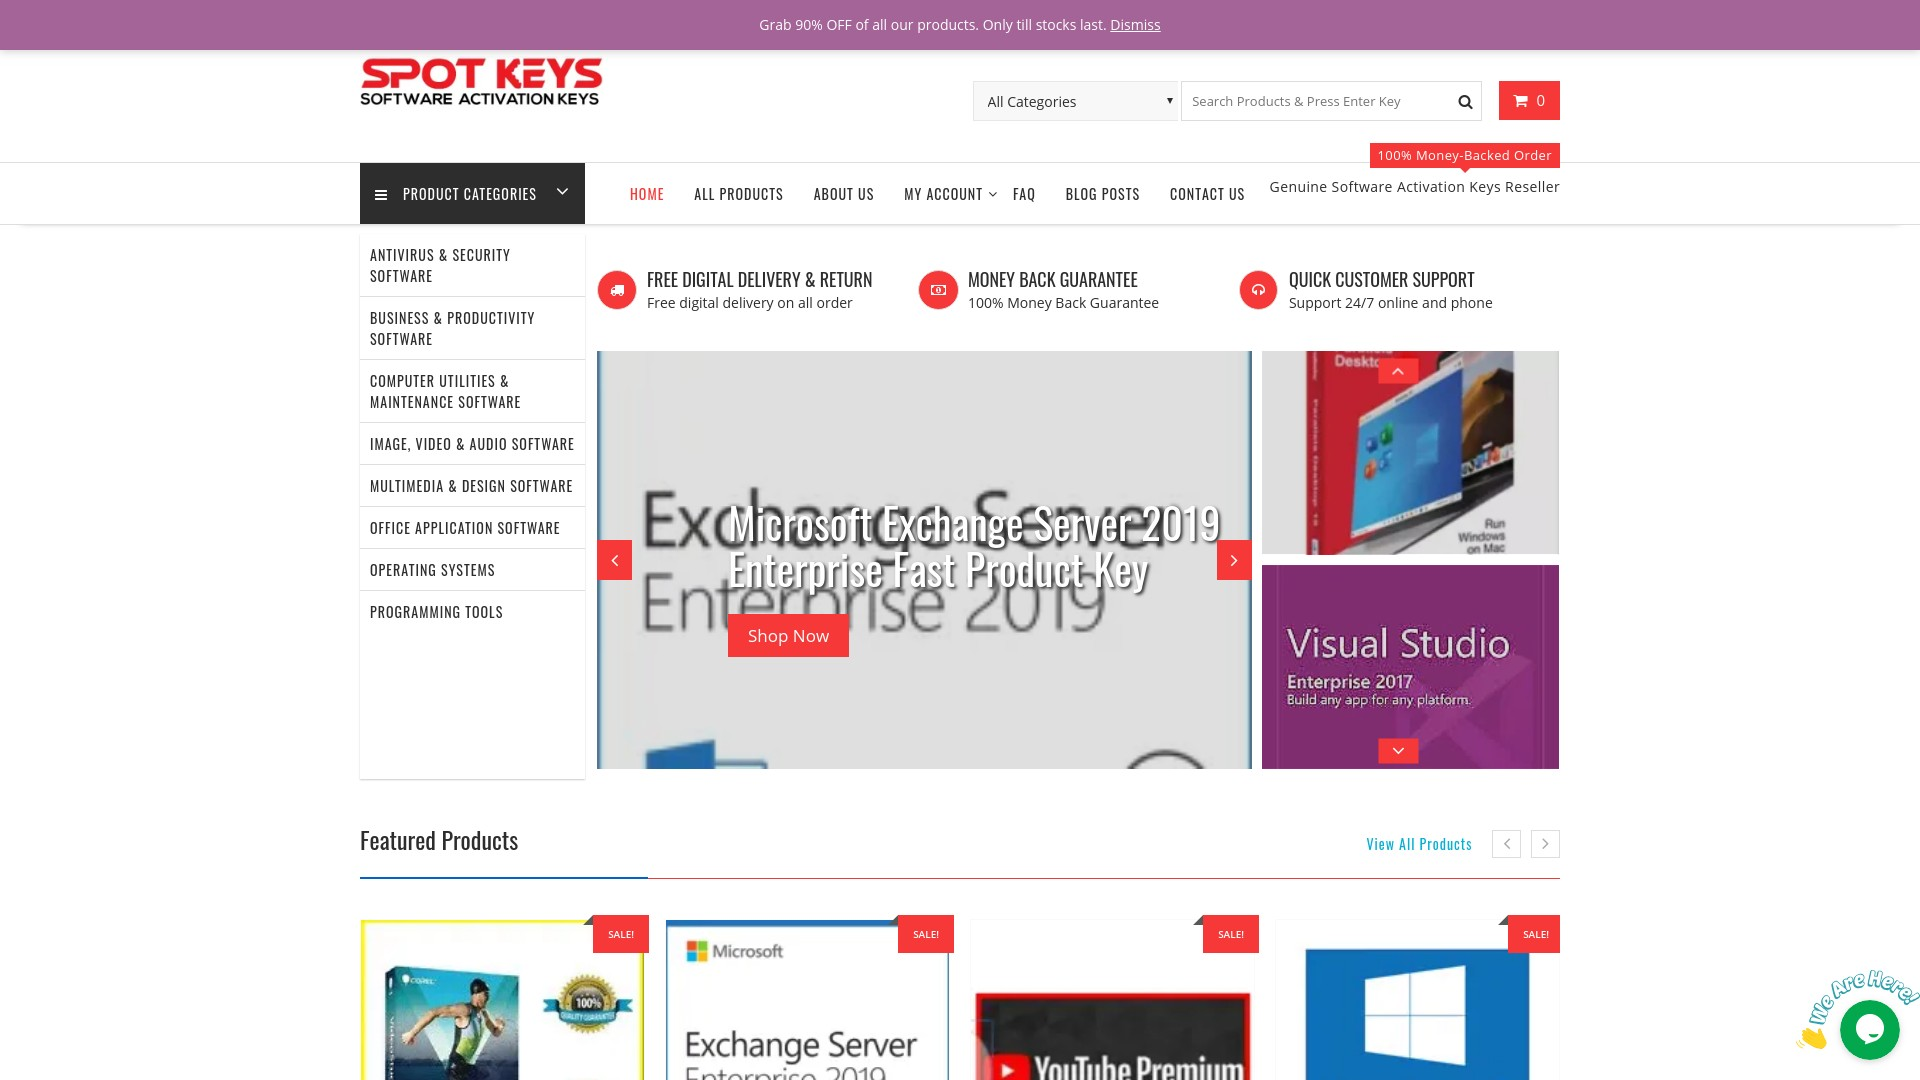 Is Spotkeys a Scam Microsoft License Key Store?